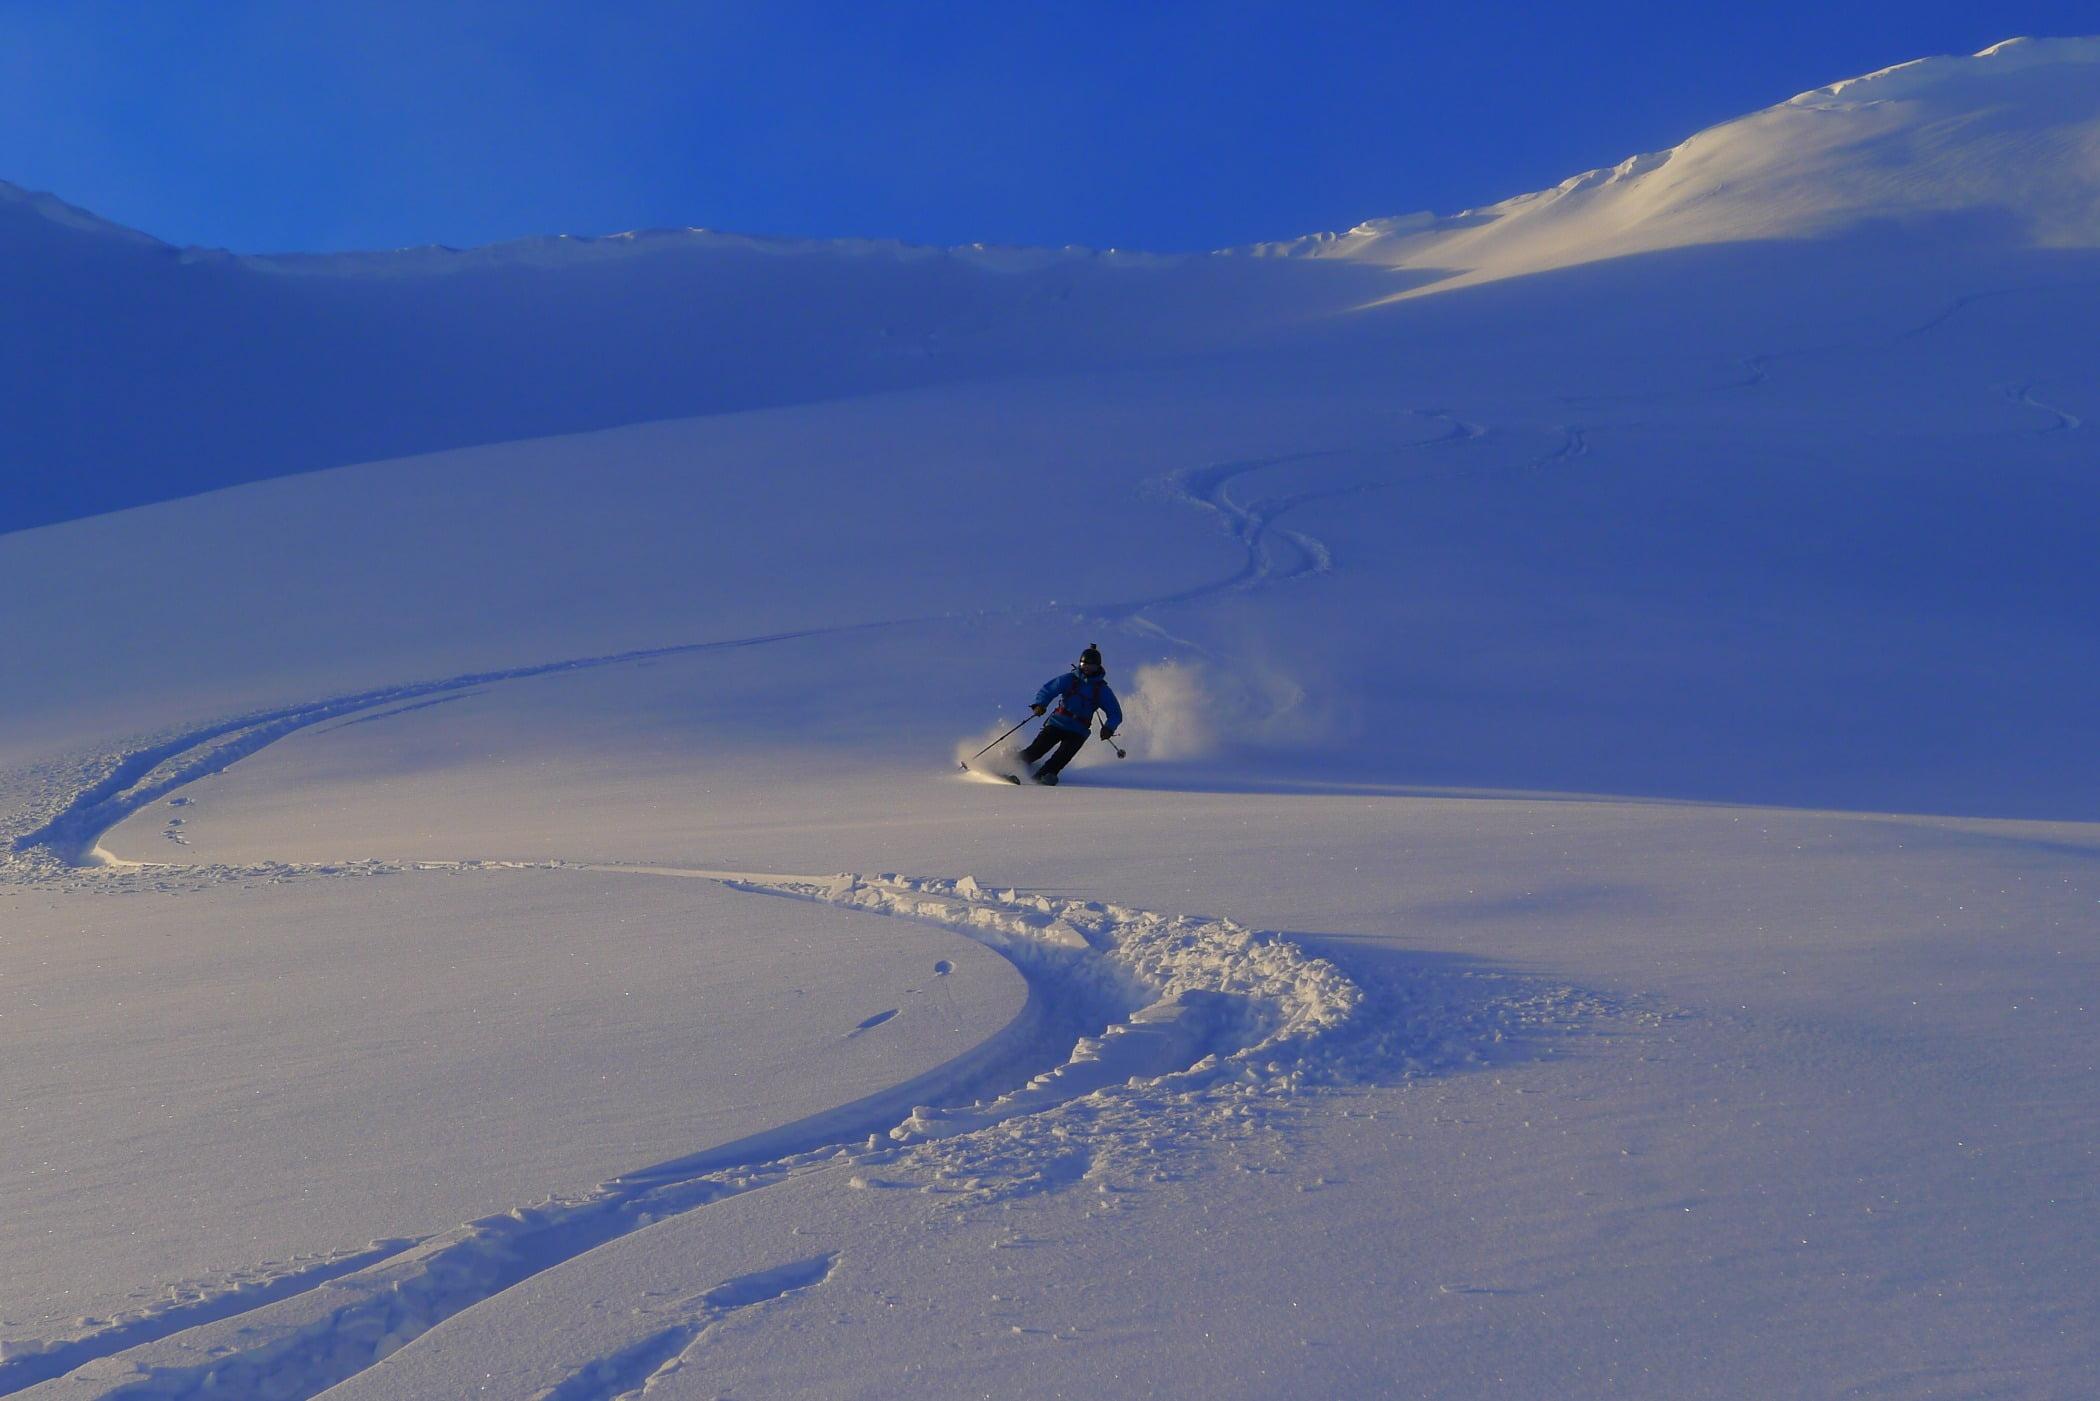 Geological phenomenon, Ice cap, Winter sport, Glacial landform, Adventure, Piste, Terrain, Atmosphere, Slope